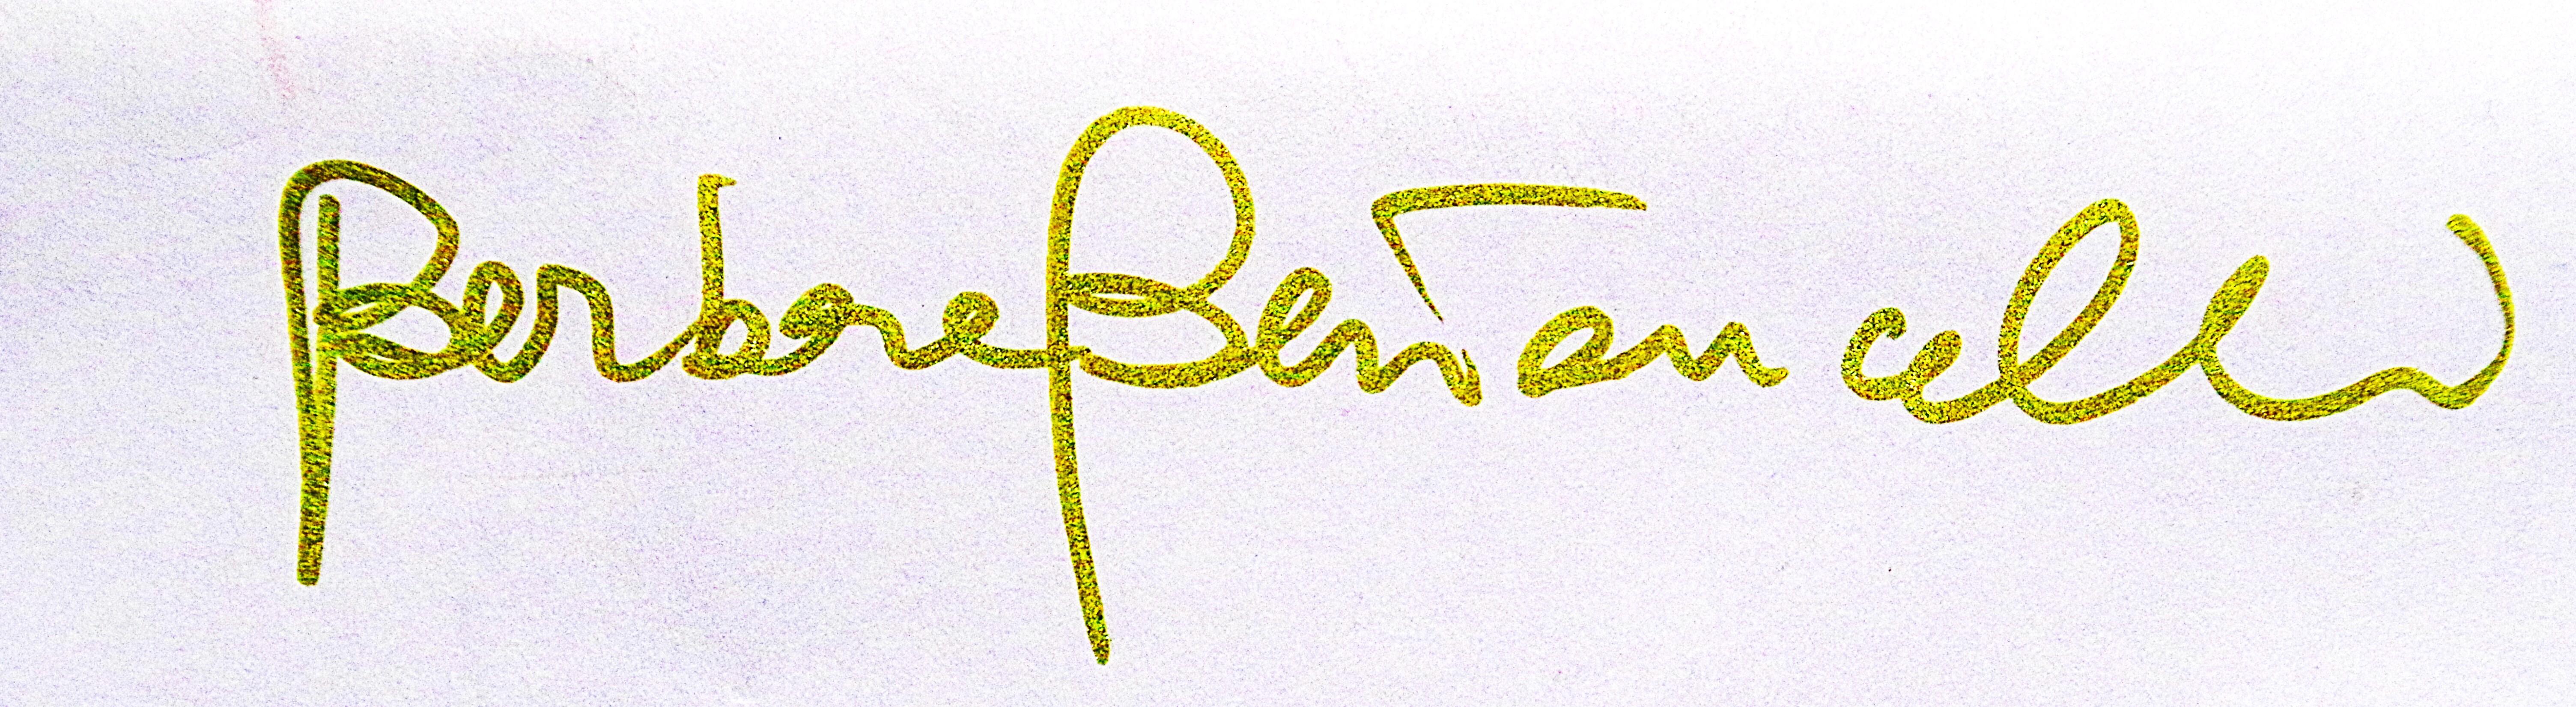 barbara bertoncelli's Signature